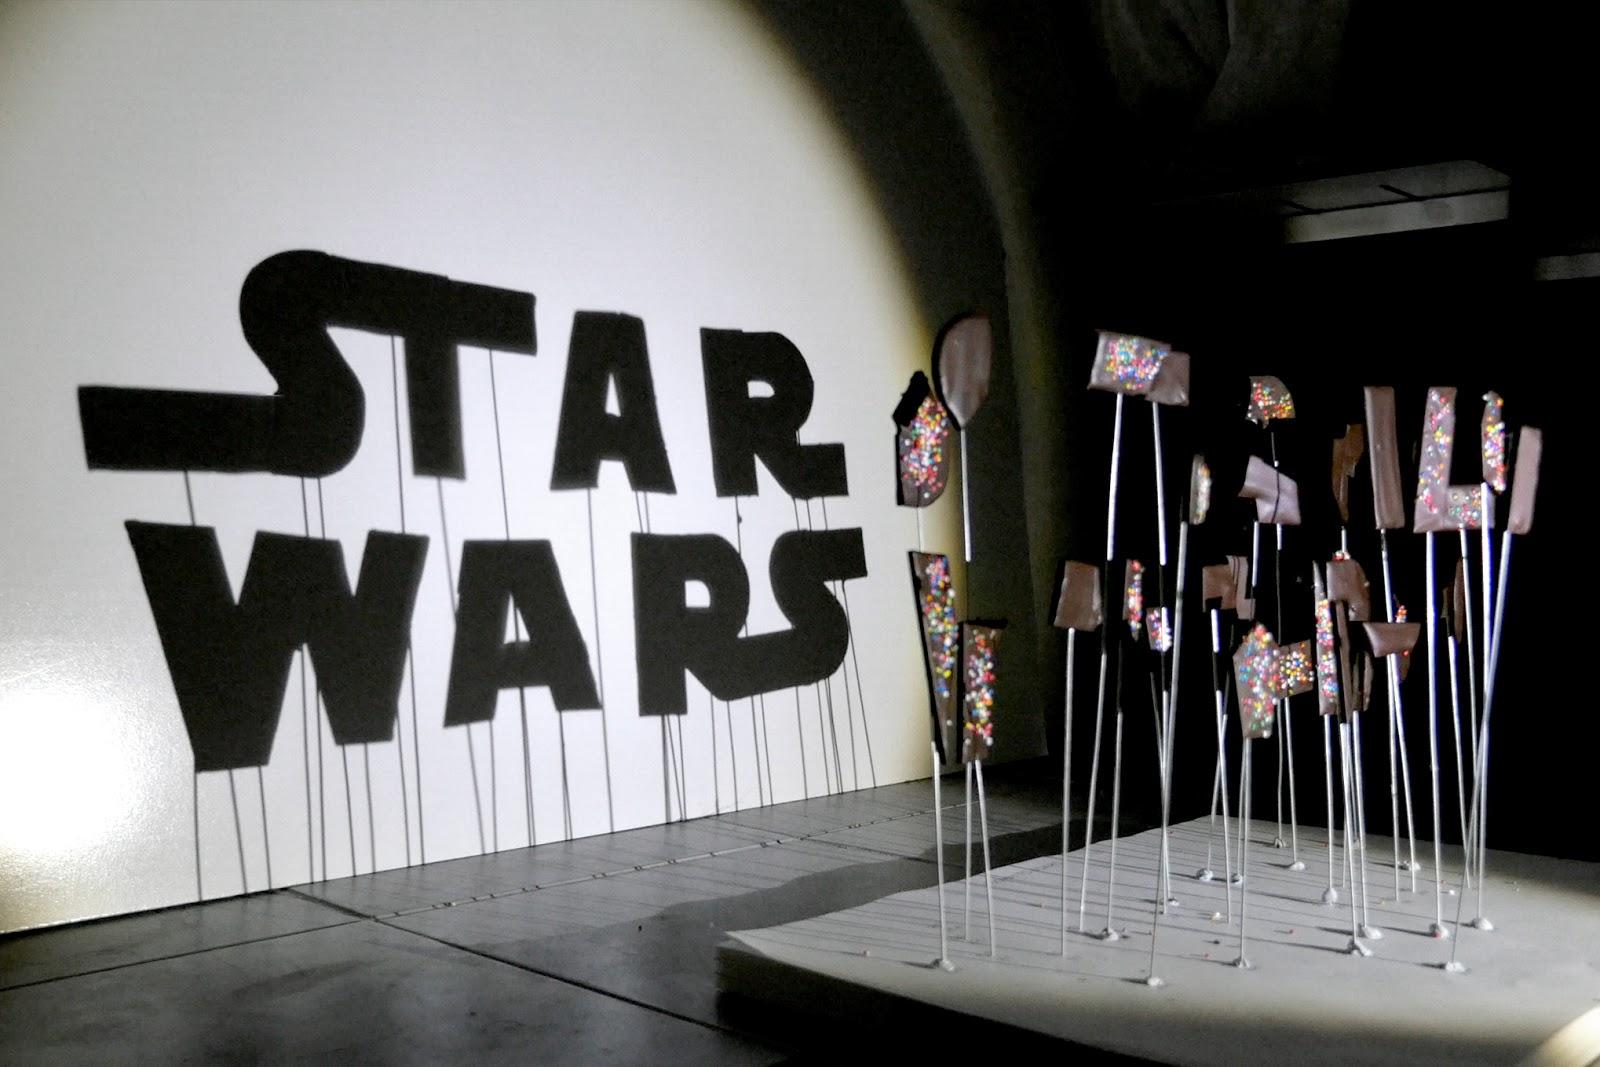 hong yi star wars